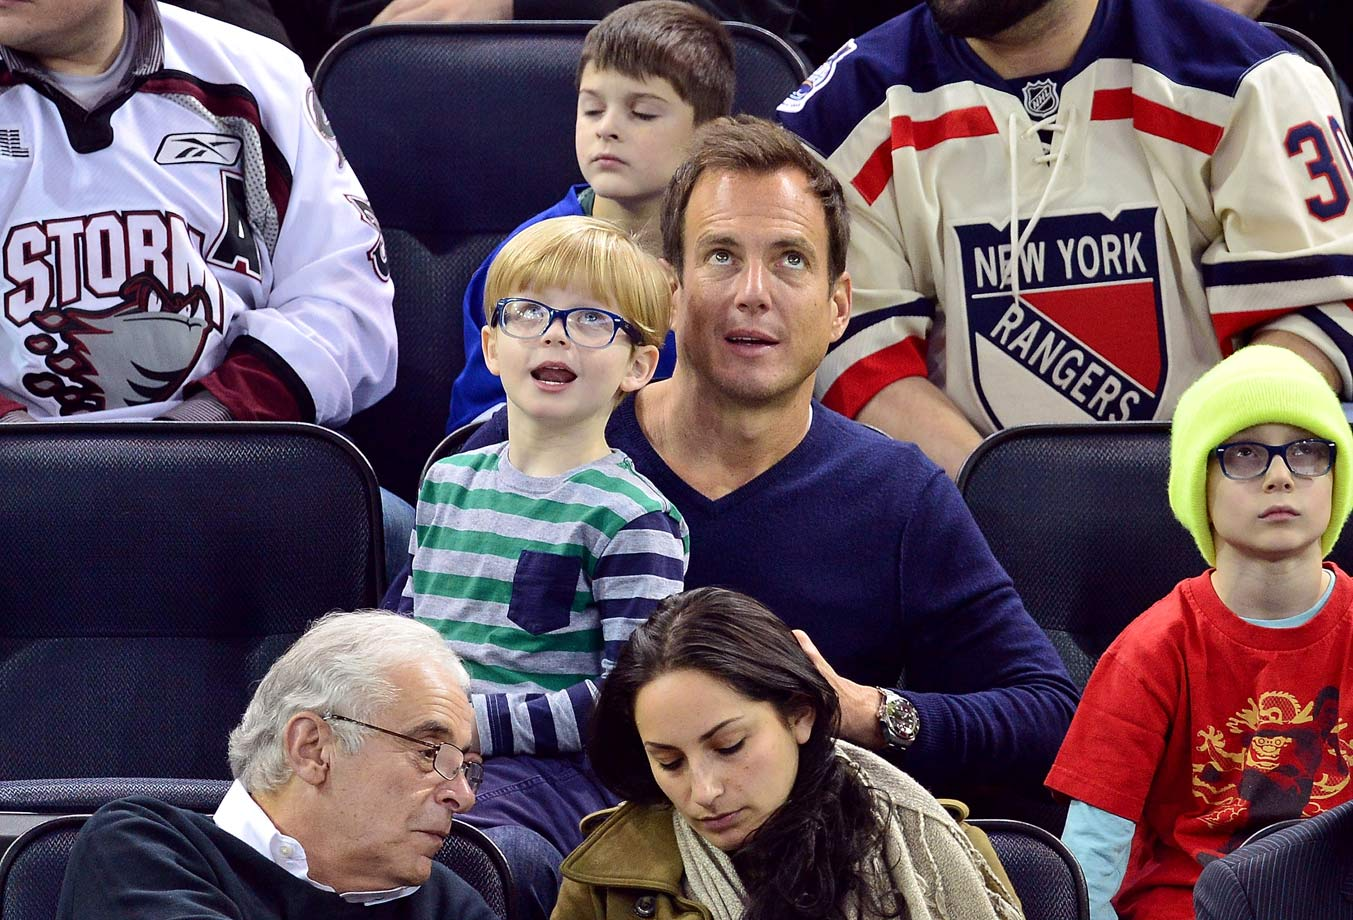 Dec. 23, 2014: New York Rangers vs. Washington Capitals at Madison Square Garden in New York City